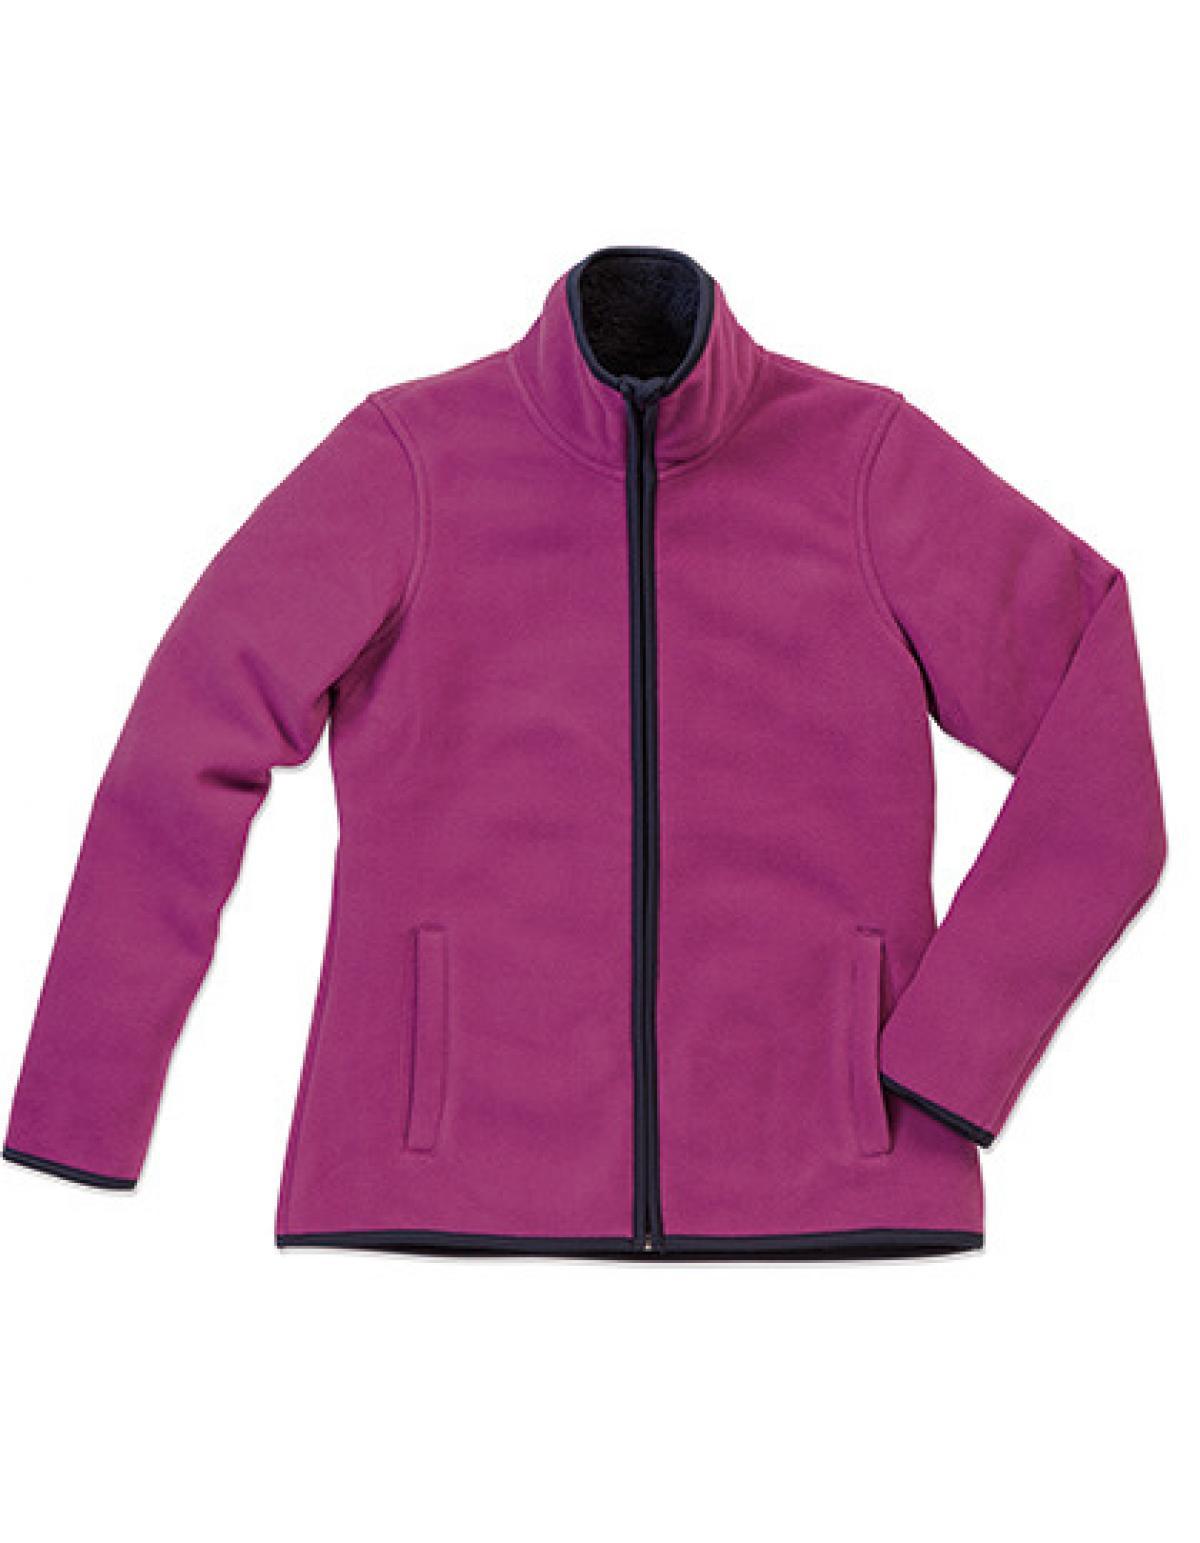 active teddy fleece jacket damen jacke ko tex wrap. Black Bedroom Furniture Sets. Home Design Ideas